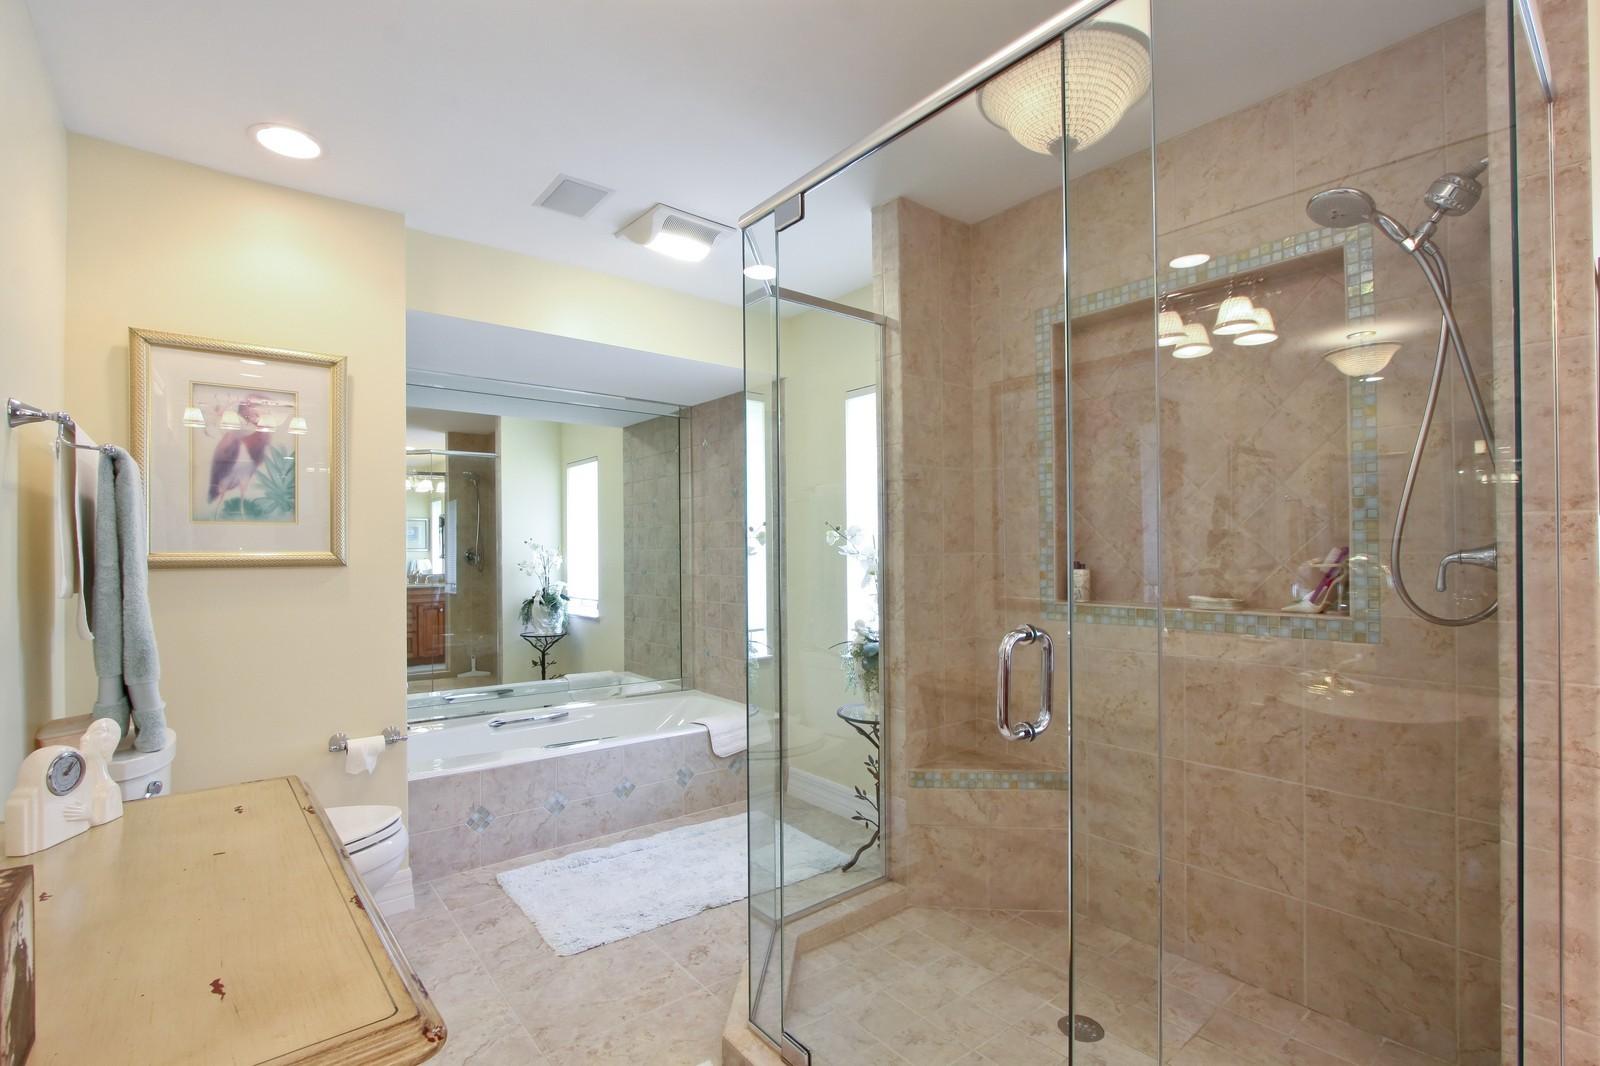 Real Estate Photography - 1986 Imperial GC Blvd, Naples, FL, 34110 - Master Bathroom